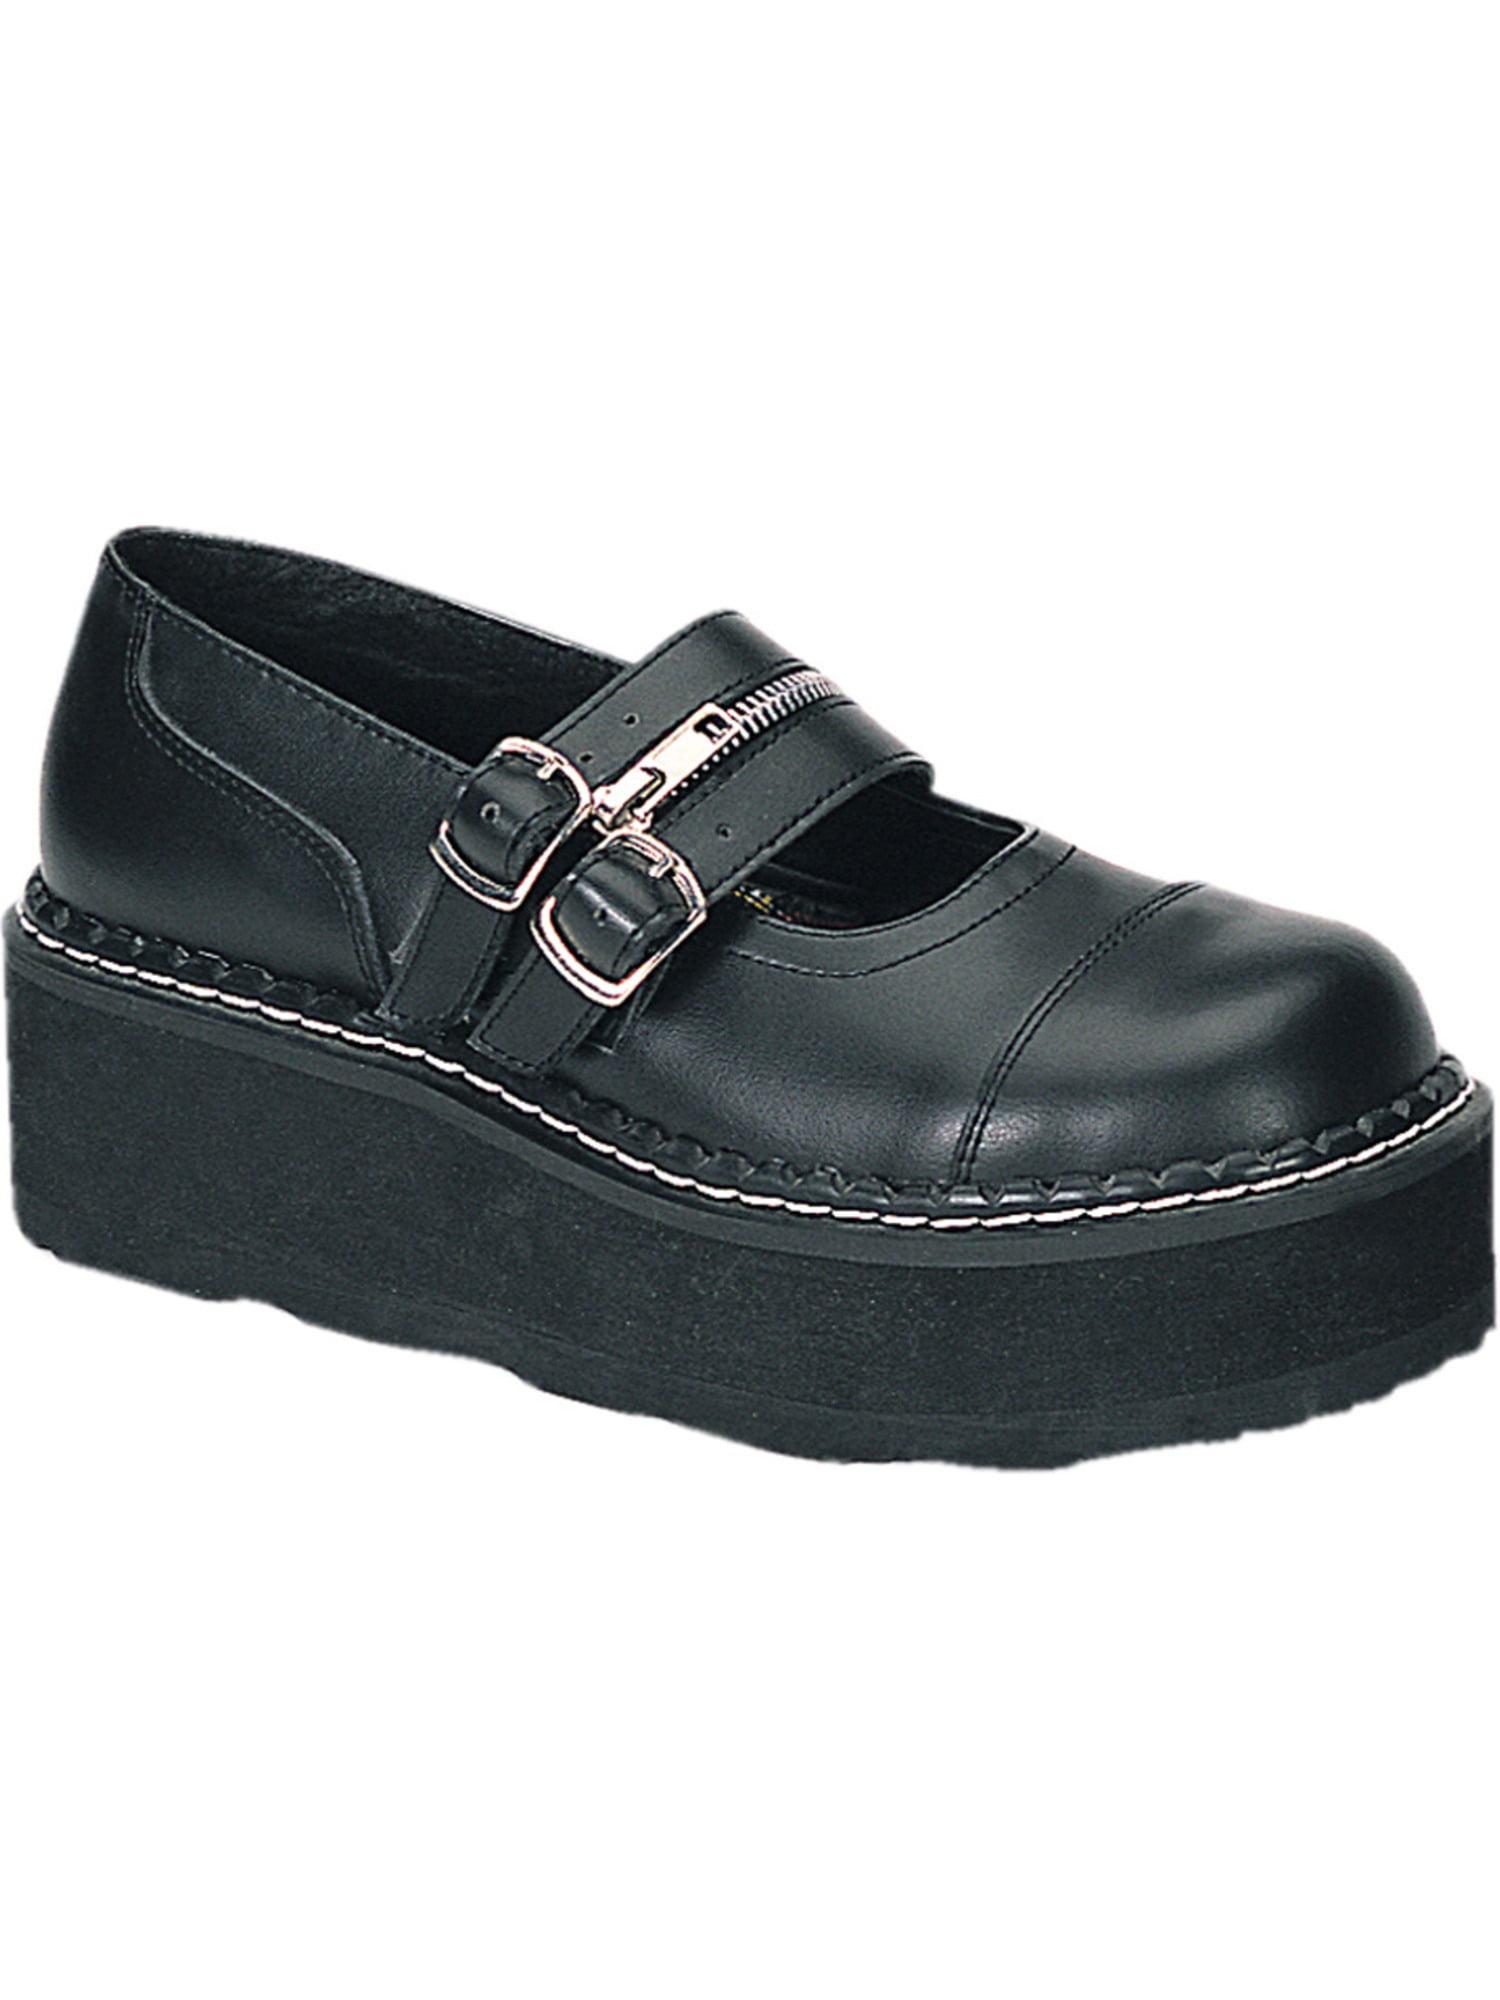 2 Inch Trendy Punk Shoe Double Strap Platform Mary Jane Shoe Black Demonia